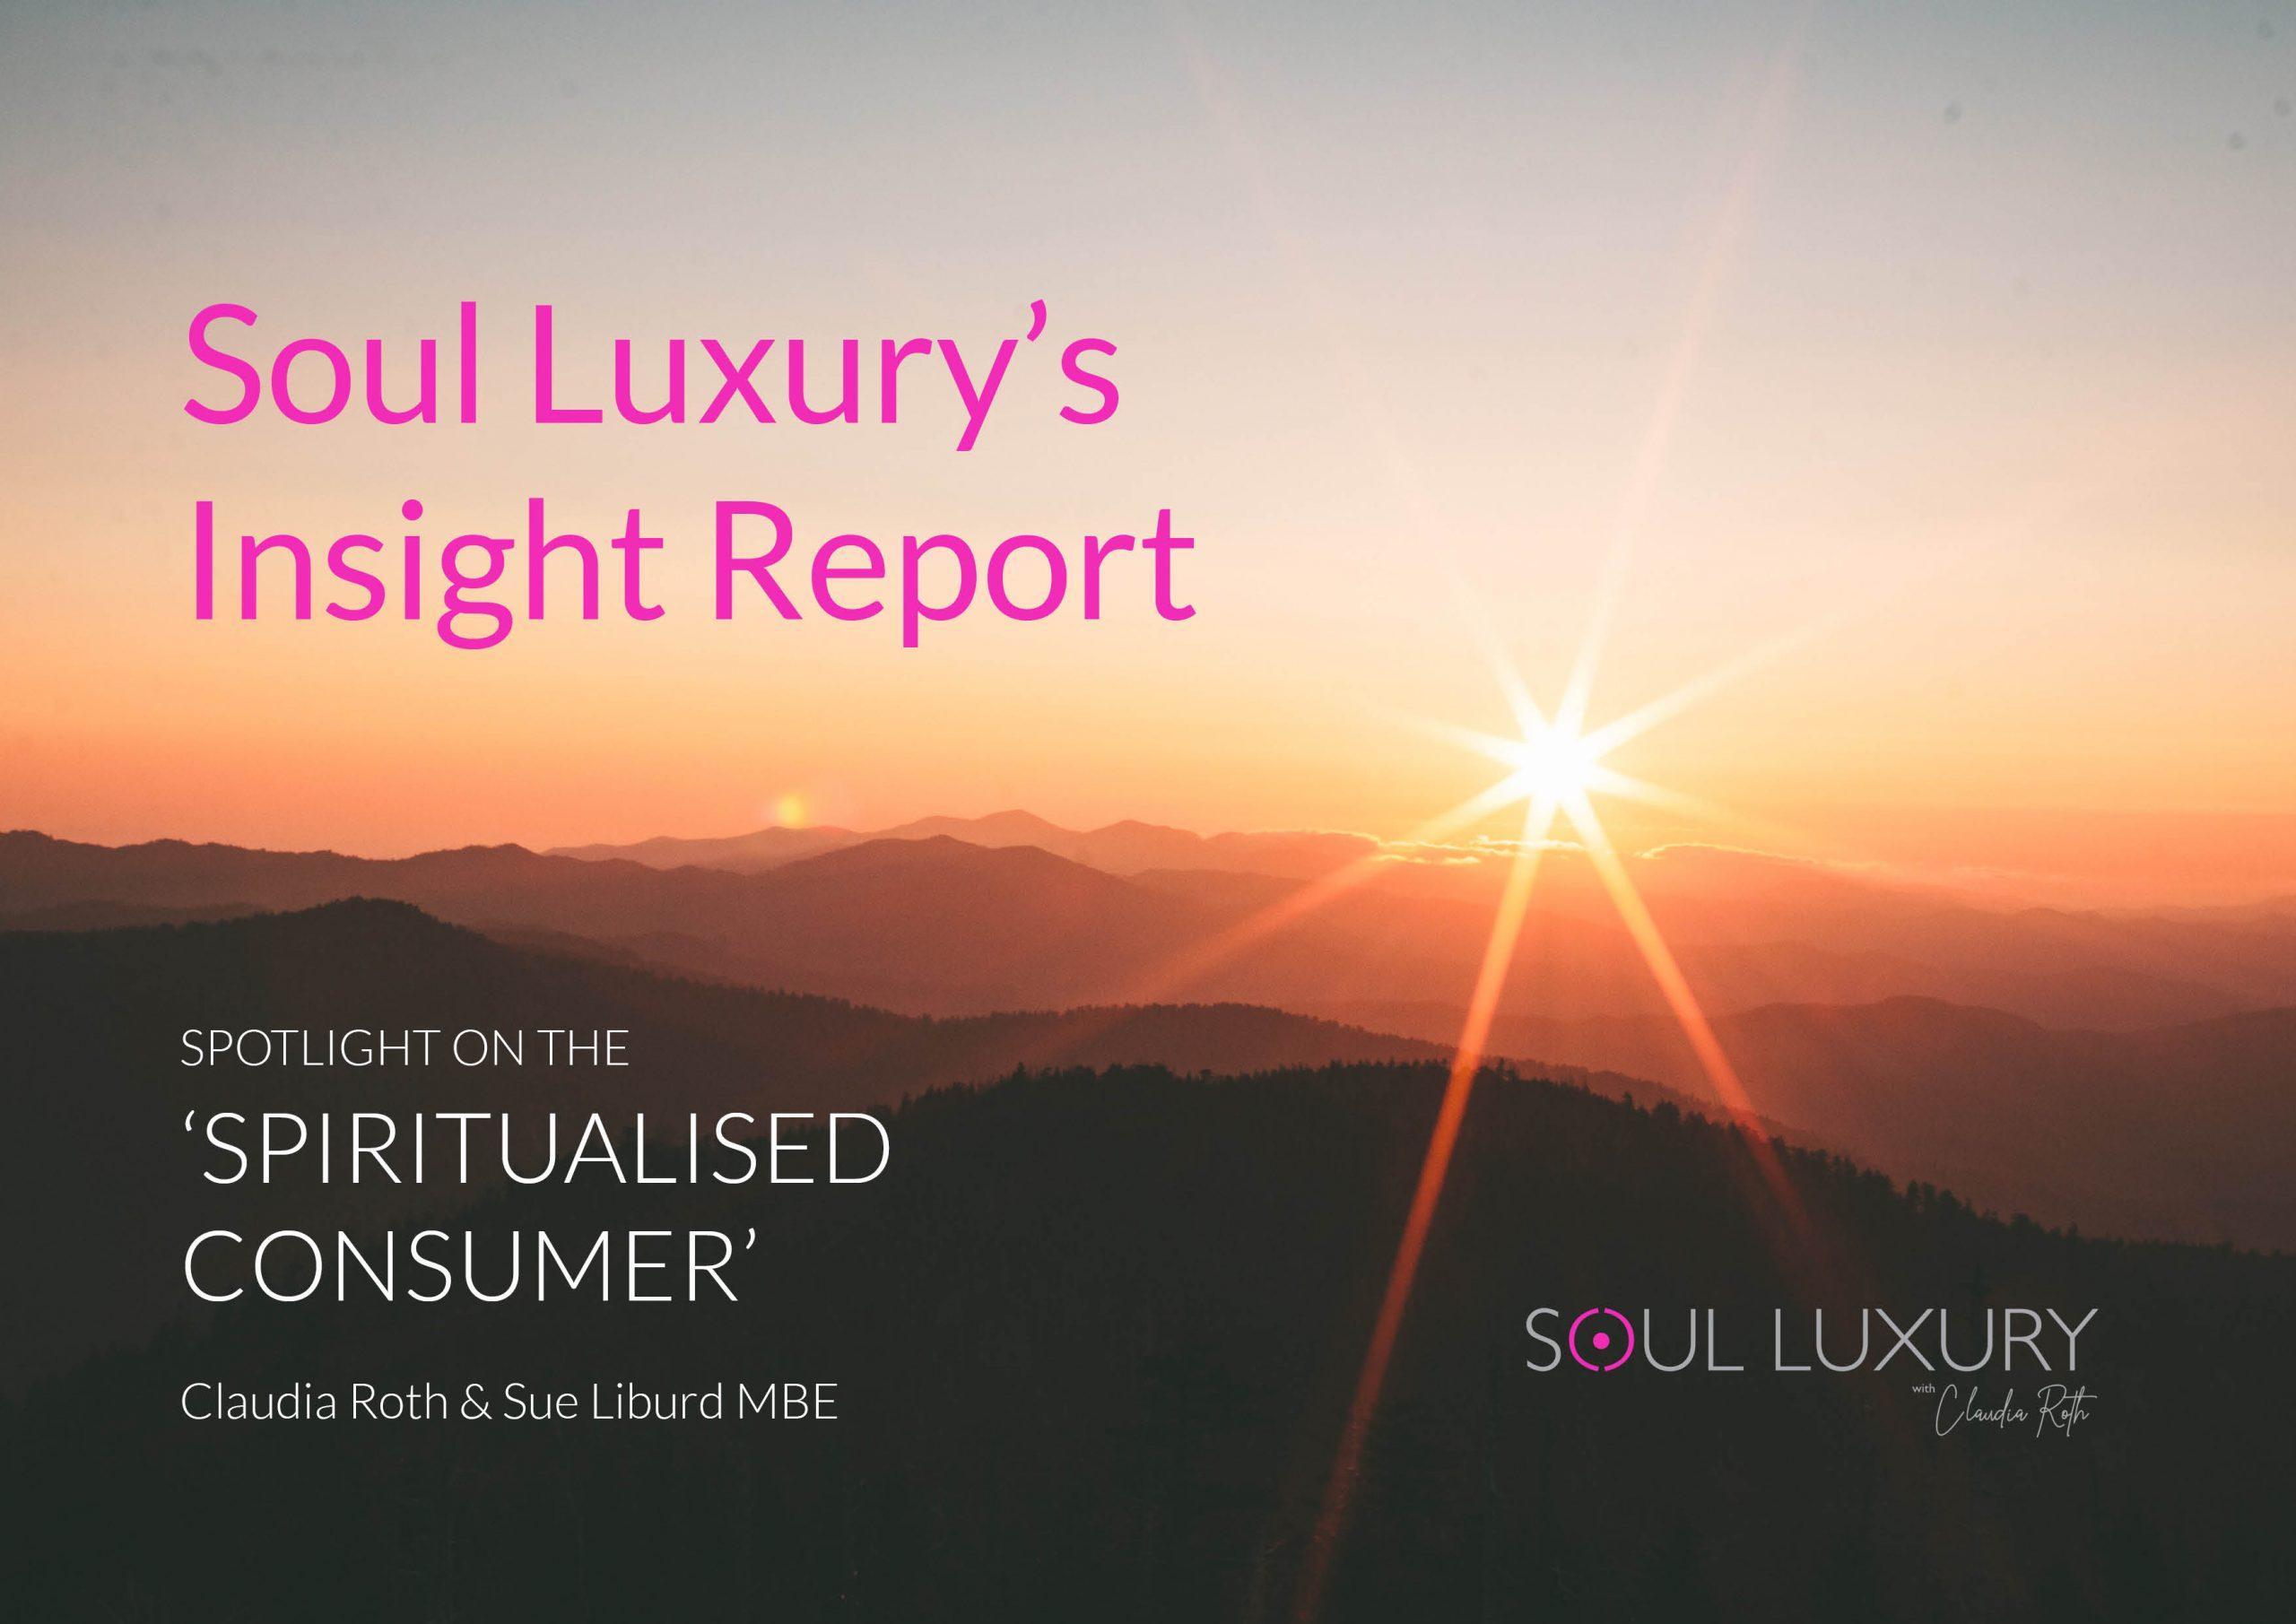 The Spiritualized Consumer